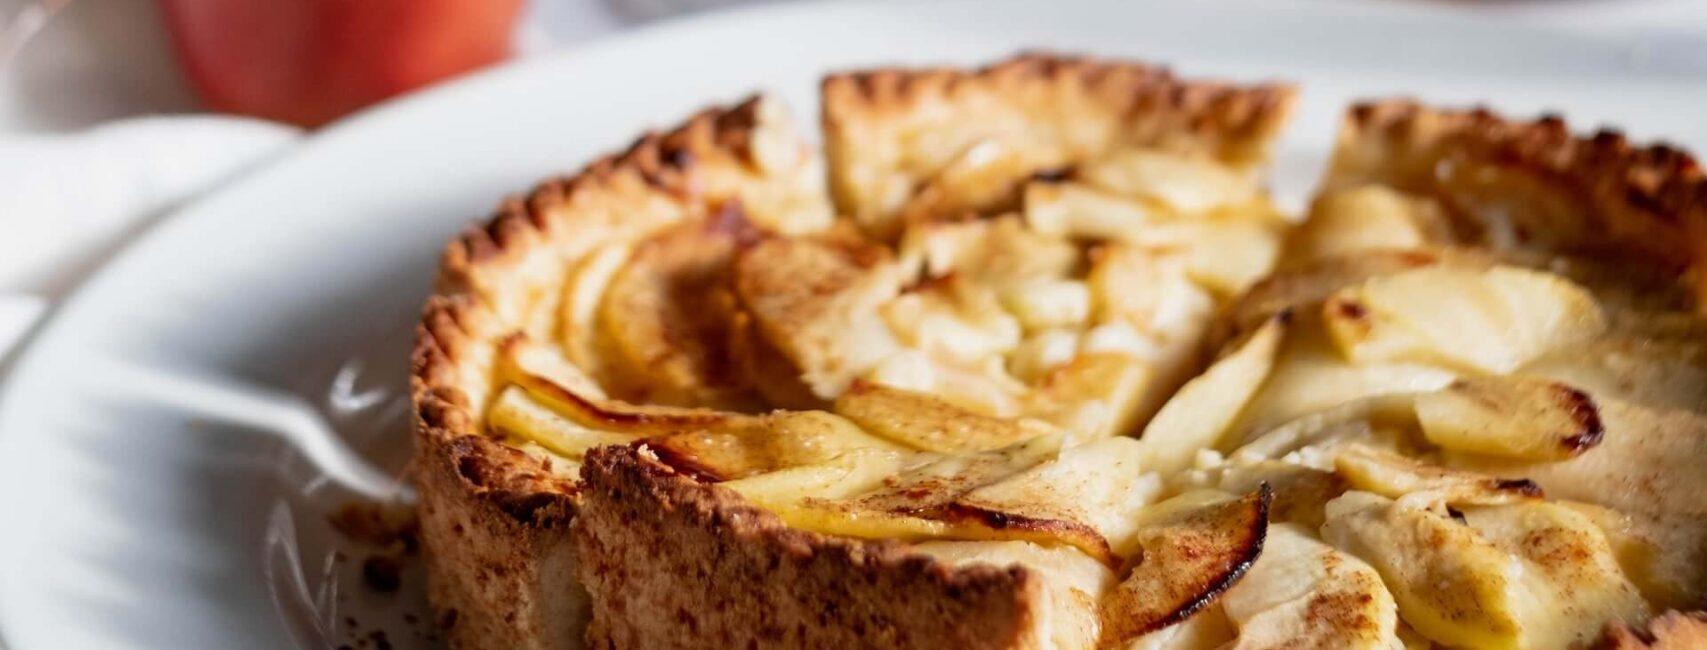 Gluten-free Crustless Apple Pie